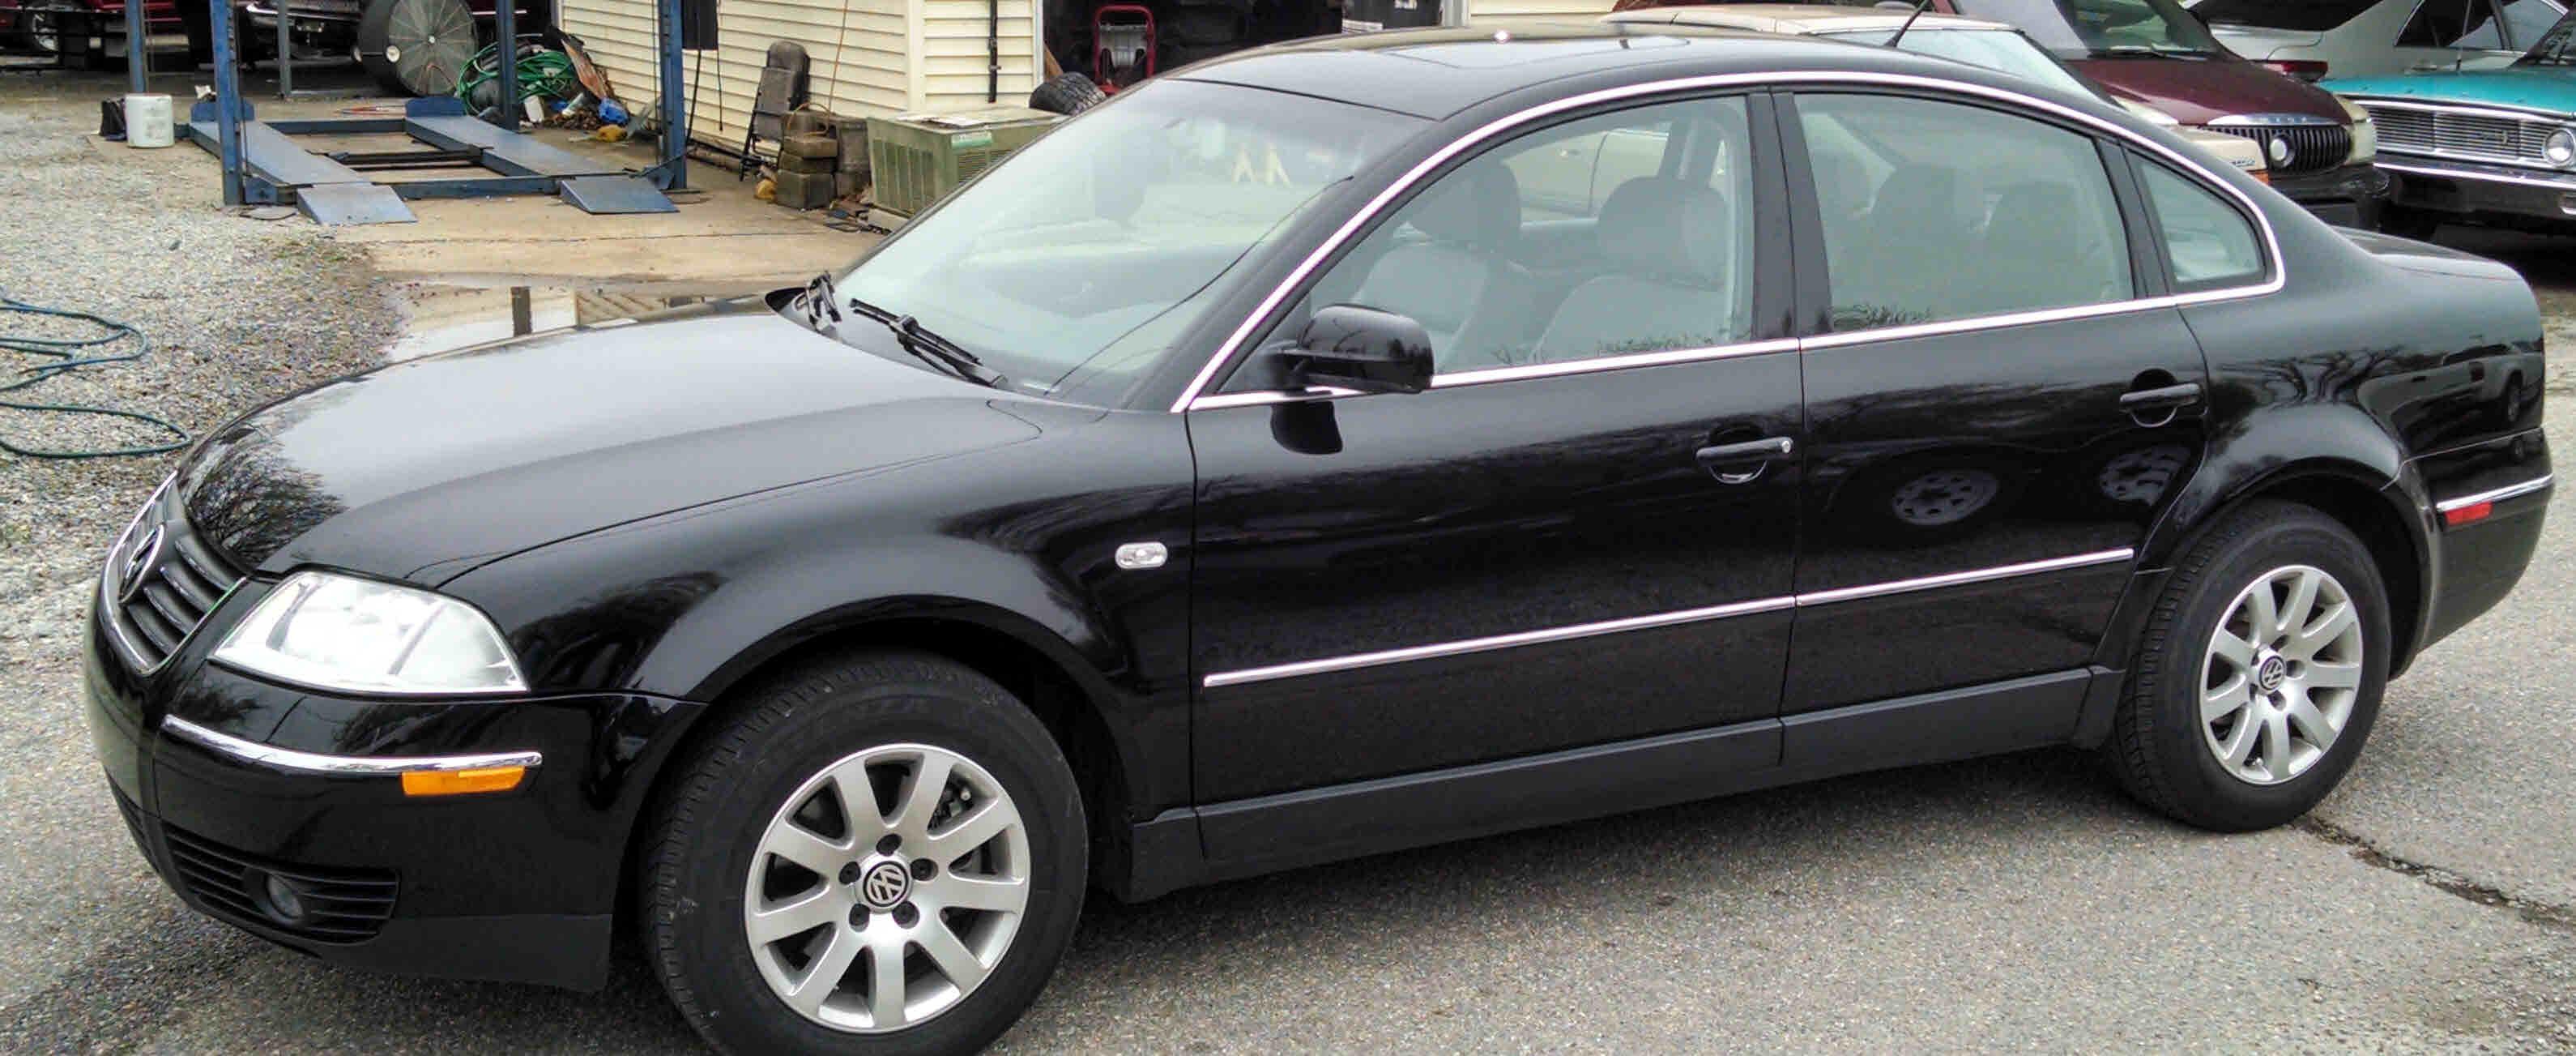 2003 vw passat 1 8t black light grey leather interior 4 cylinder 1 8 turbo auto one owner 4 door power sunroof a c cruise tilt am fm